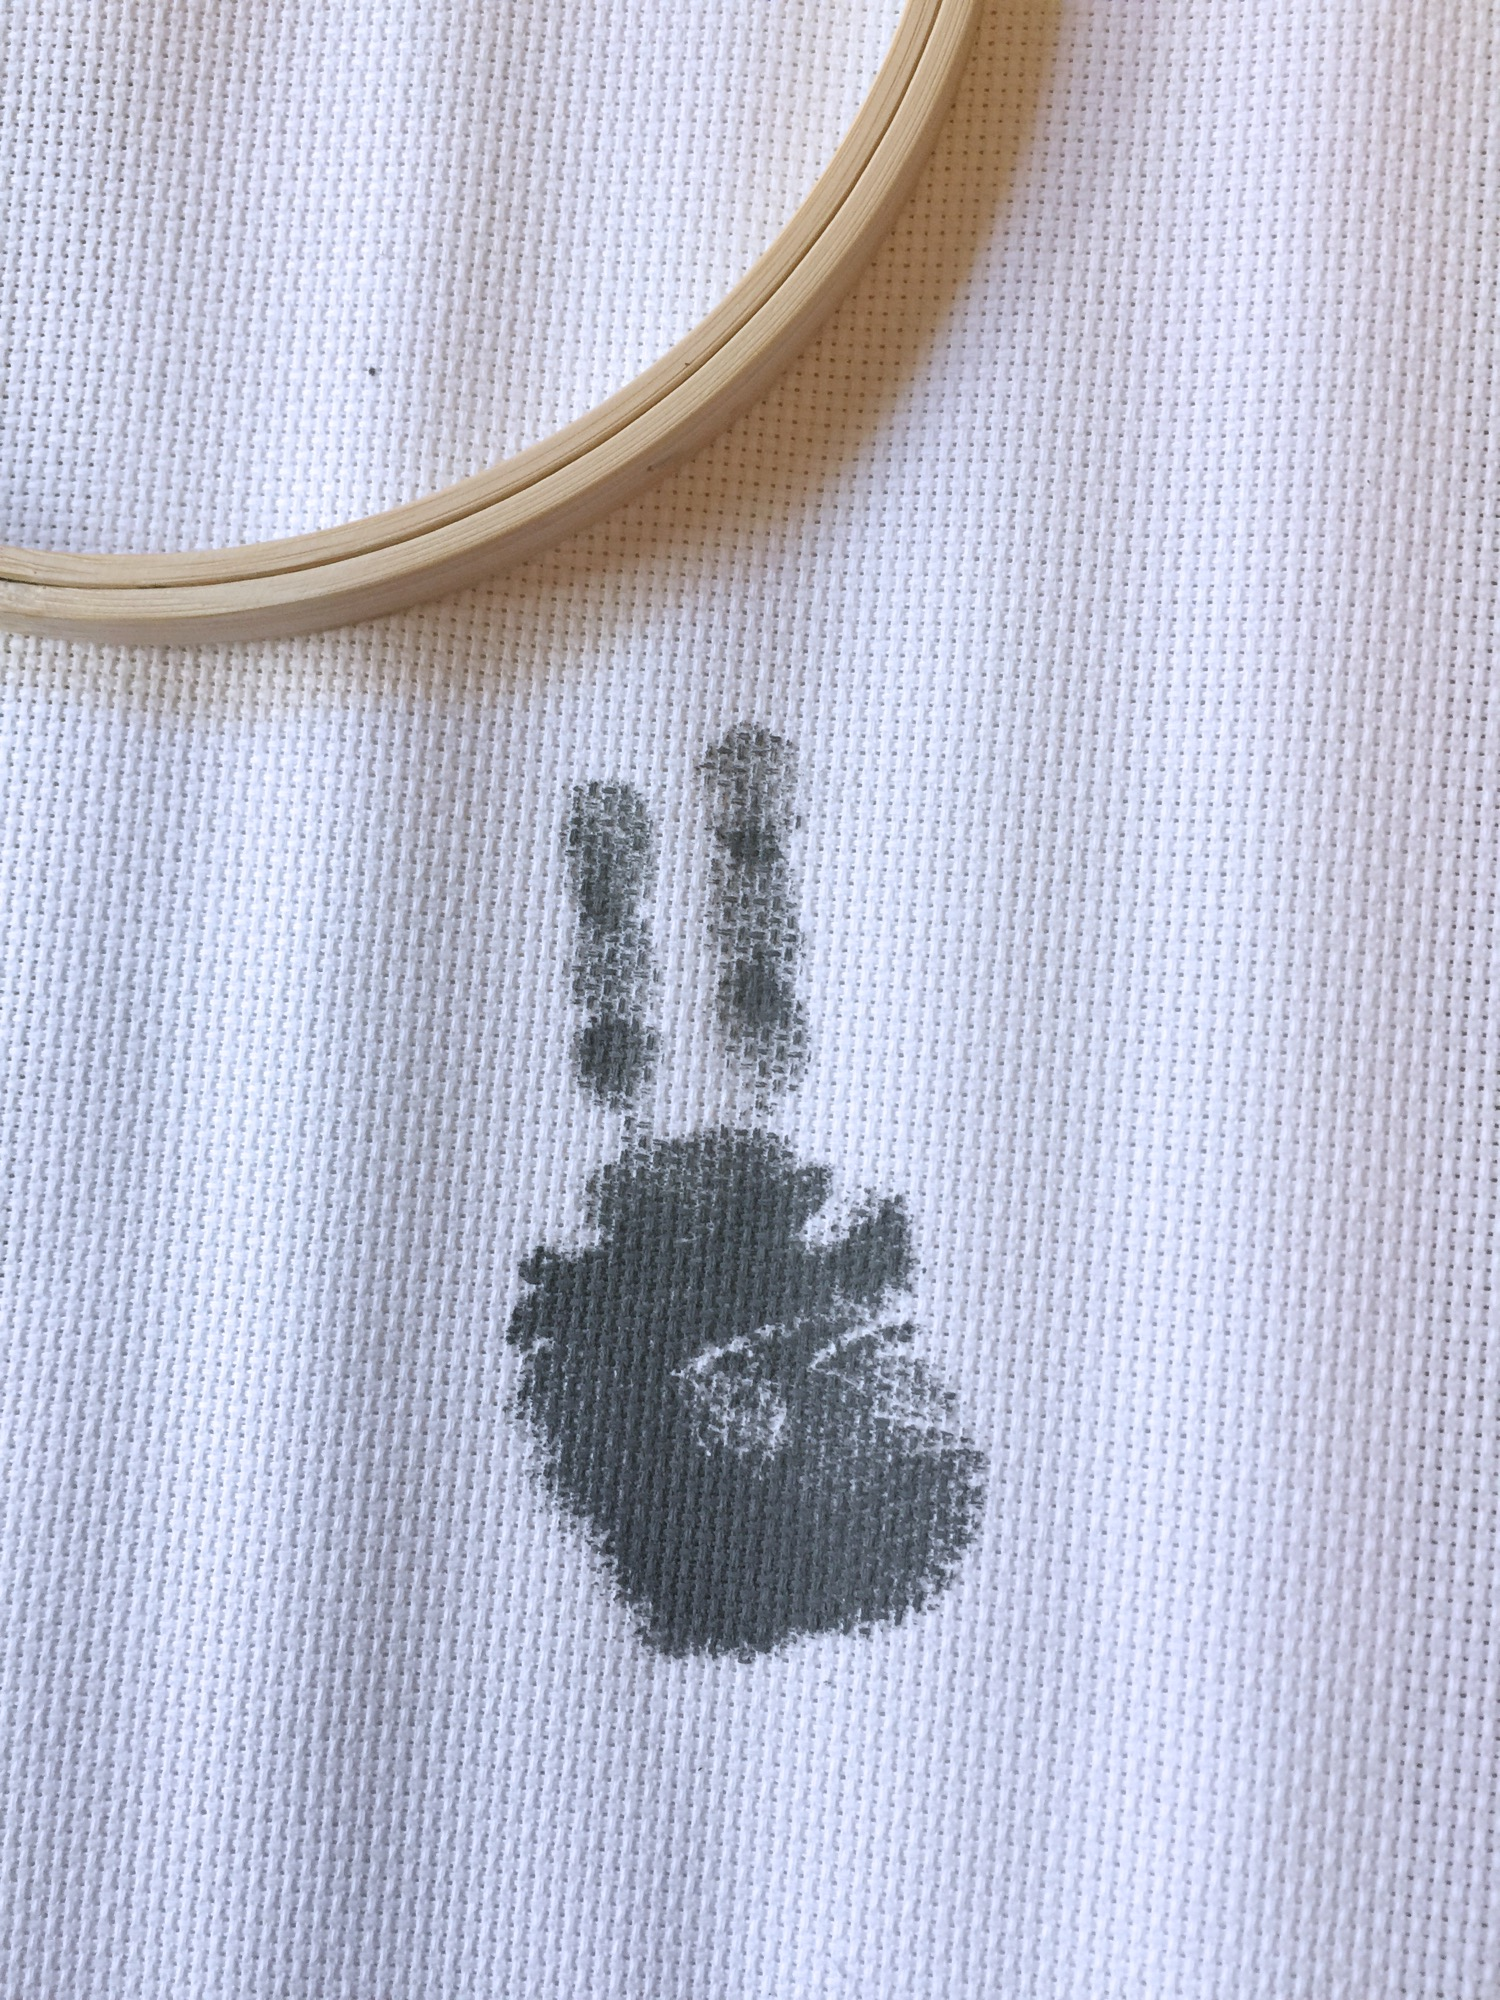 Just handprint